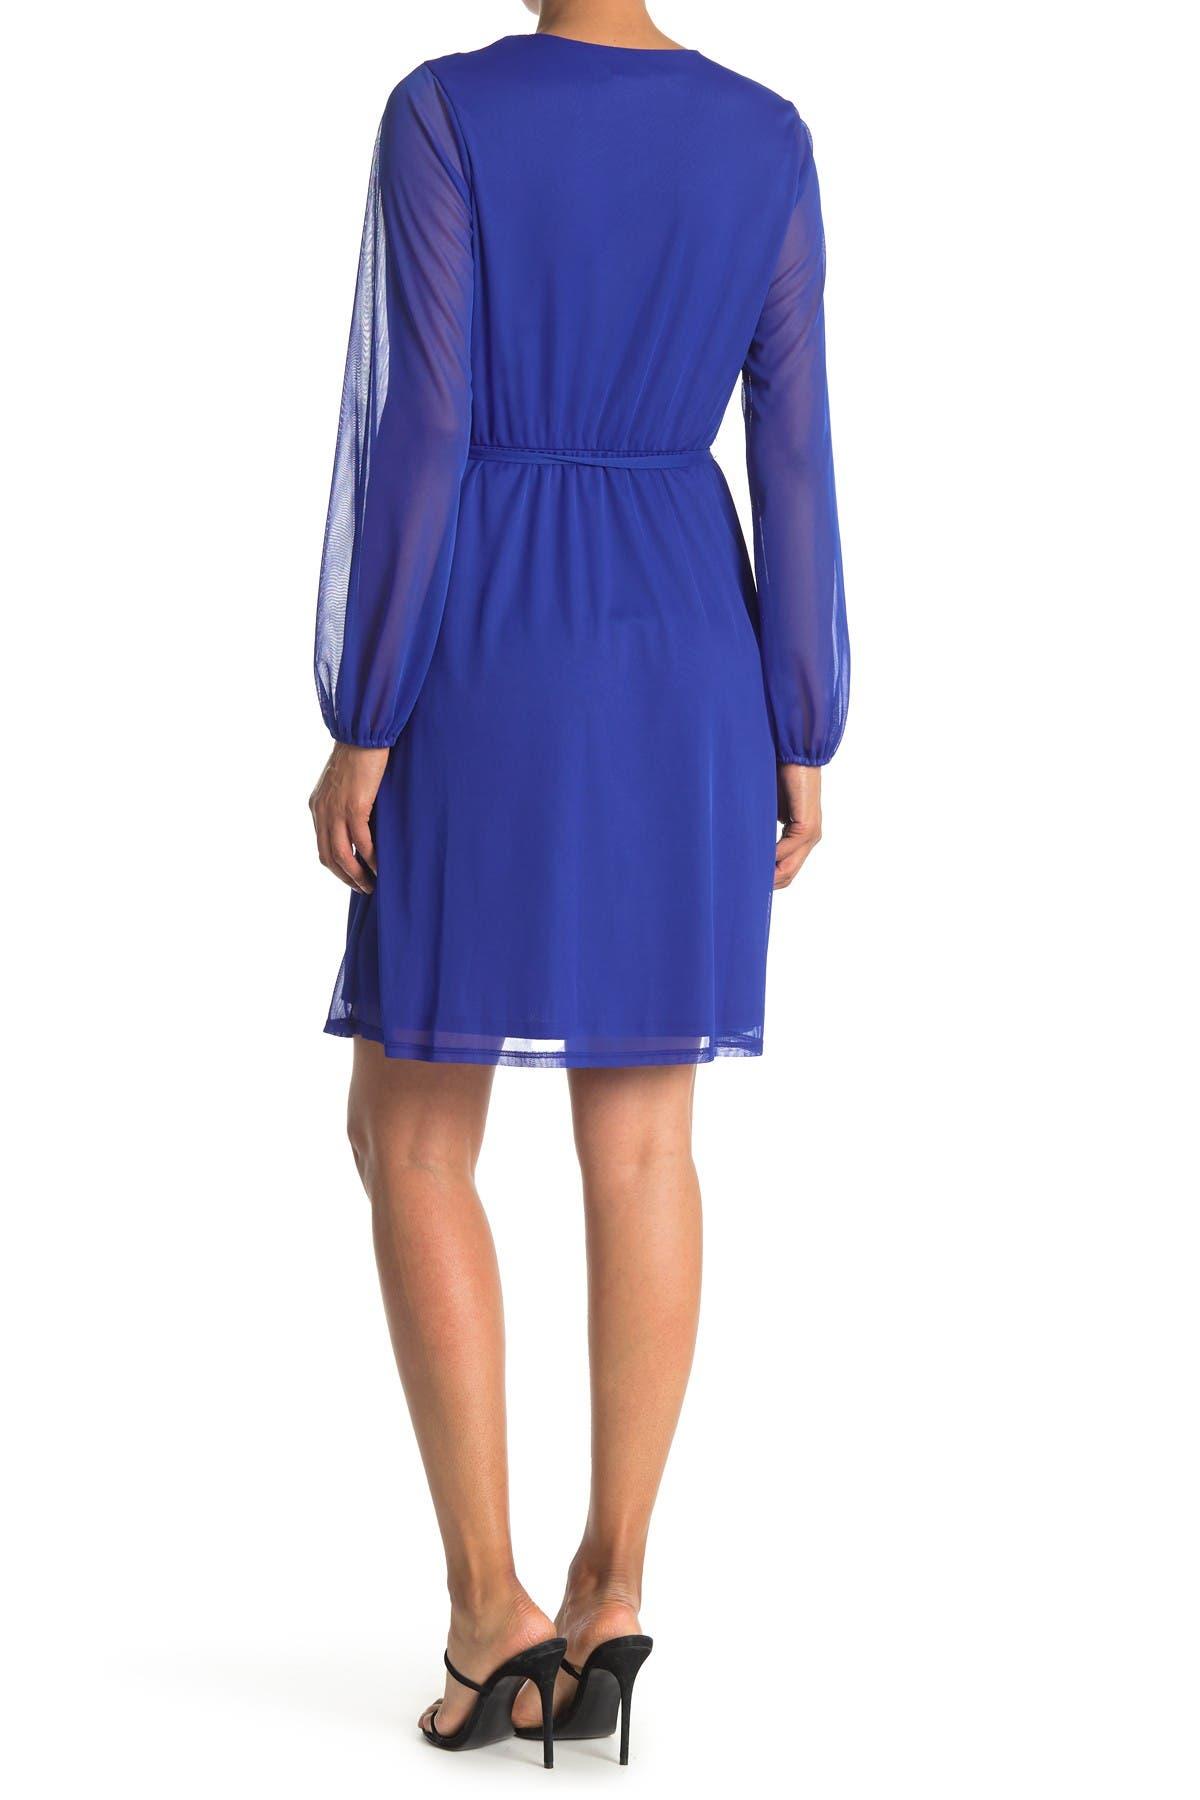 Image of TASH + SOPHIE Long Sleeve Faux Wrap Dress